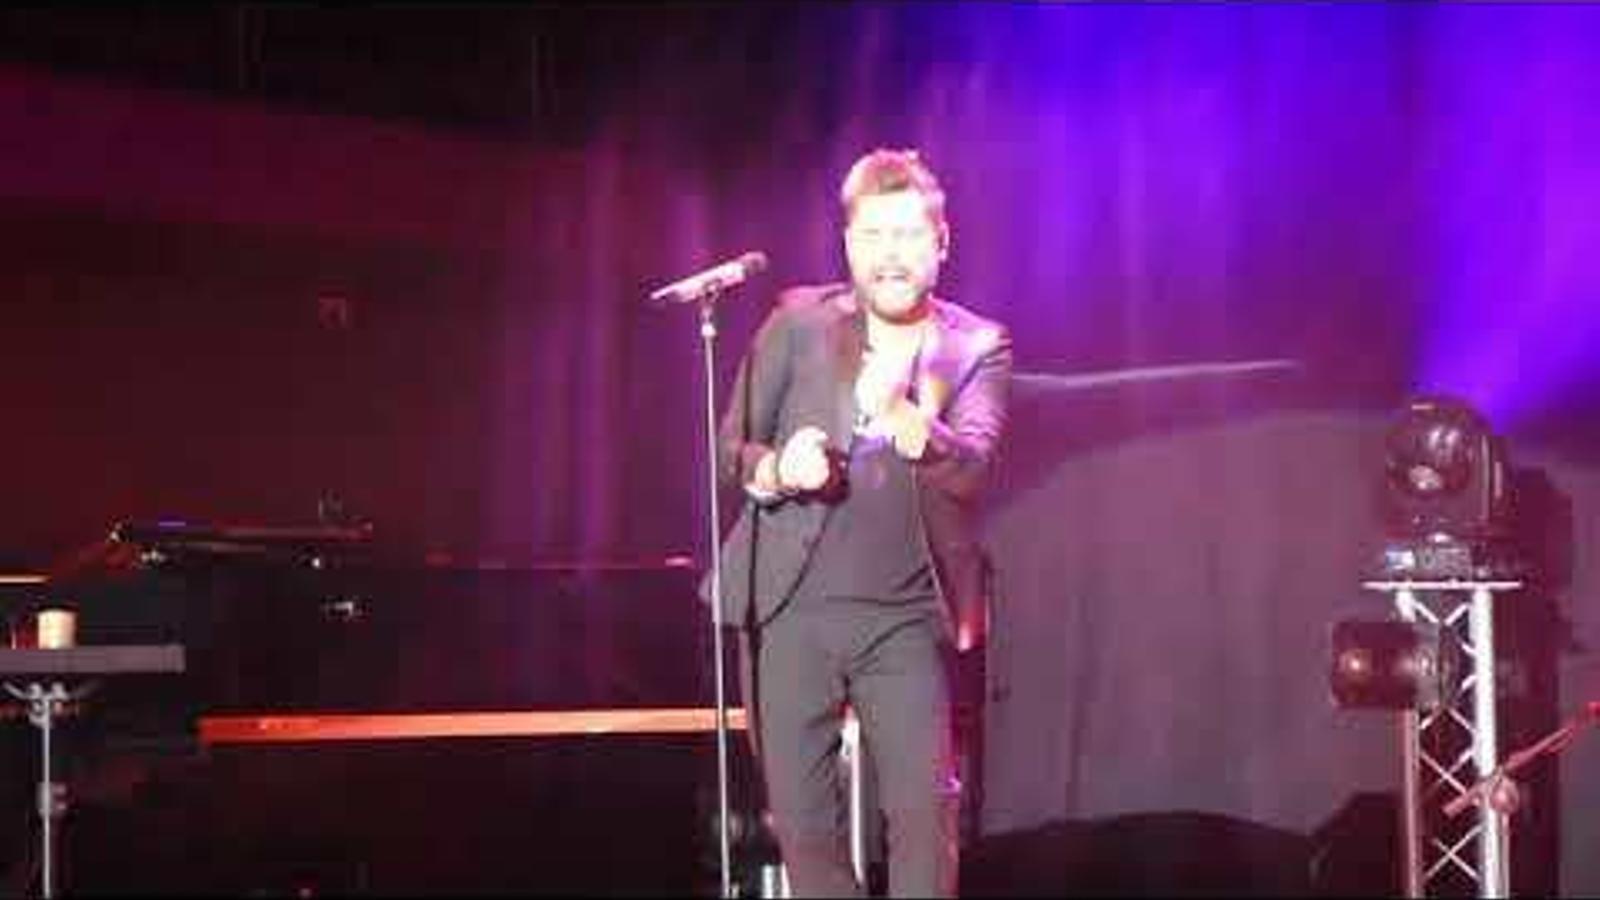 Concert de Miguel Poveda a l'Auditori Nacional